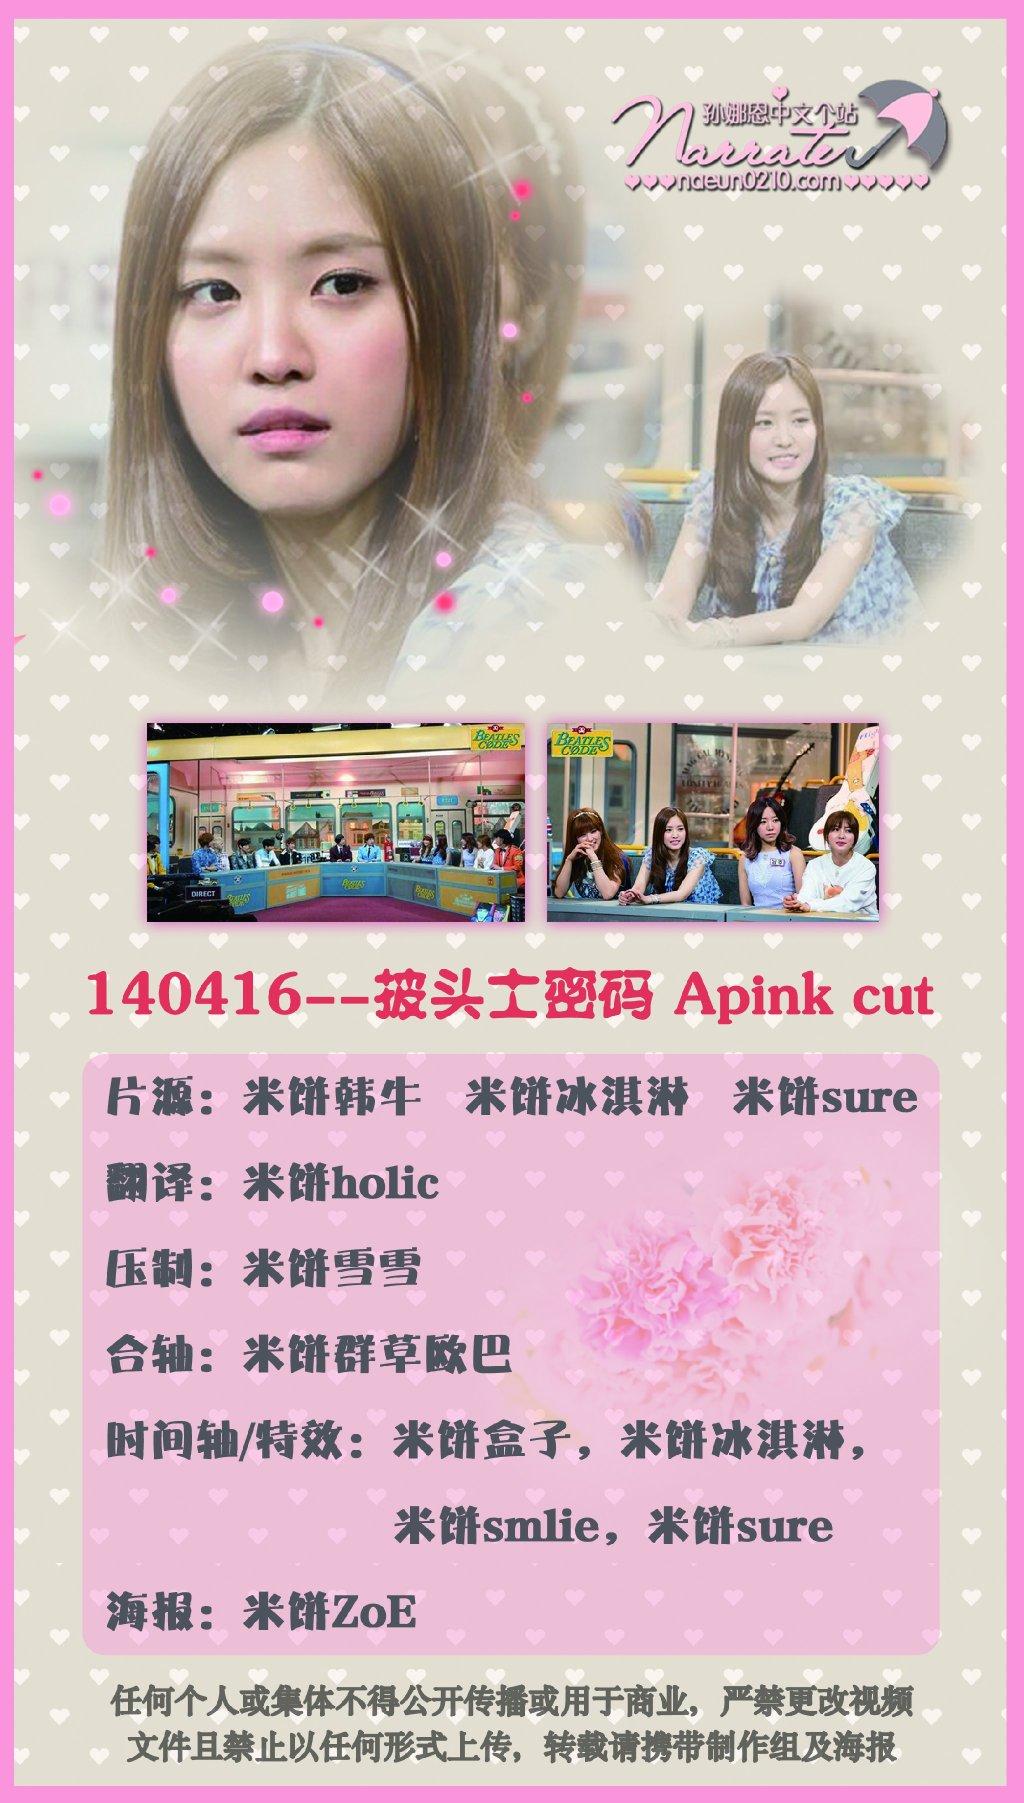 140415 Mnet 披頭士密碼 Apink Cut 中字